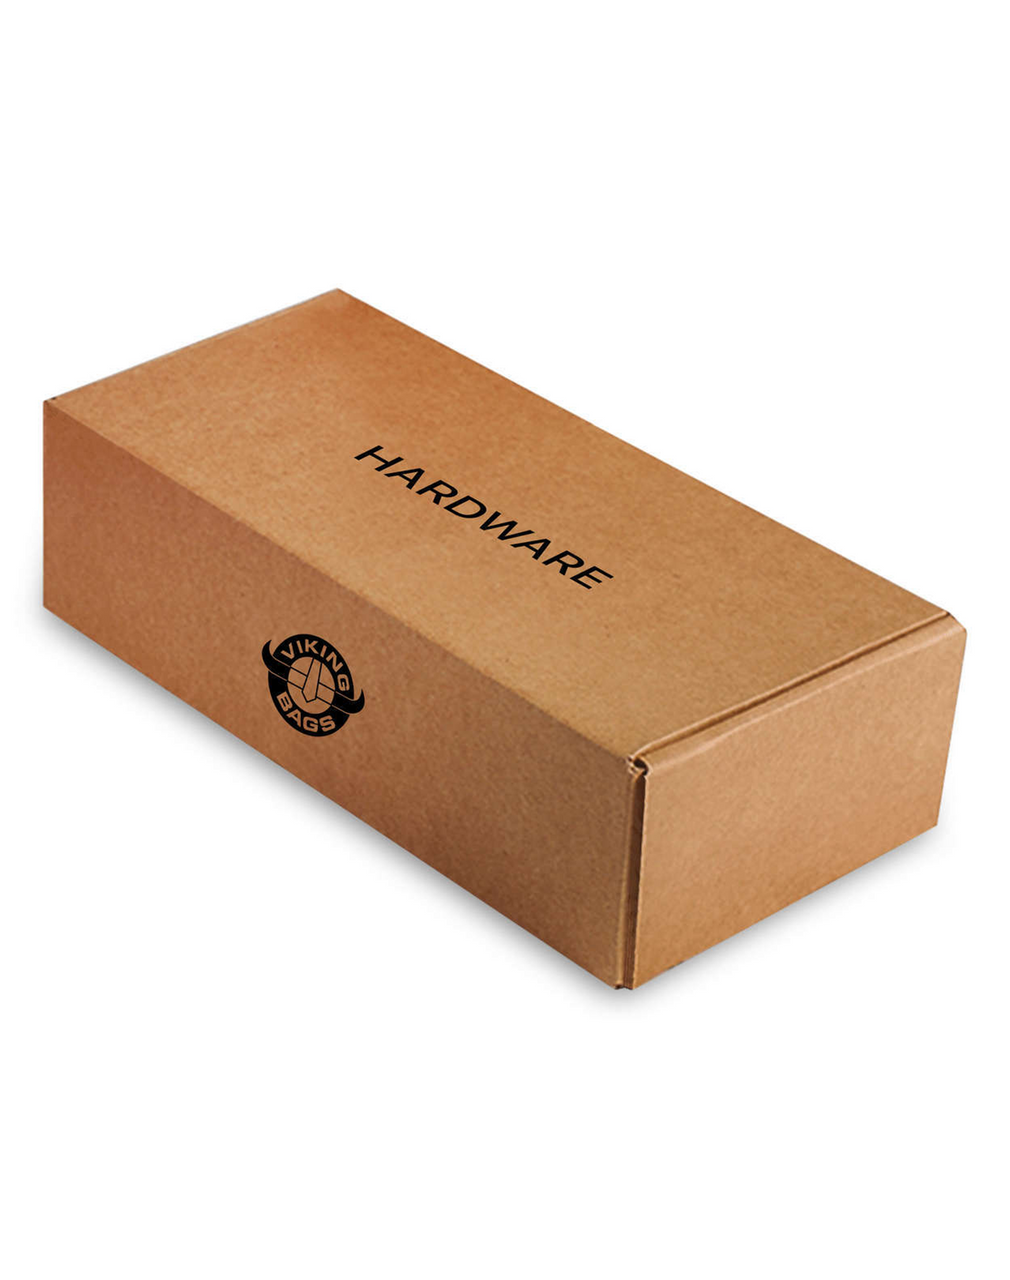 Indian Chief Standard Medium Studded Single Strap Motorcycle Saddlebags Box